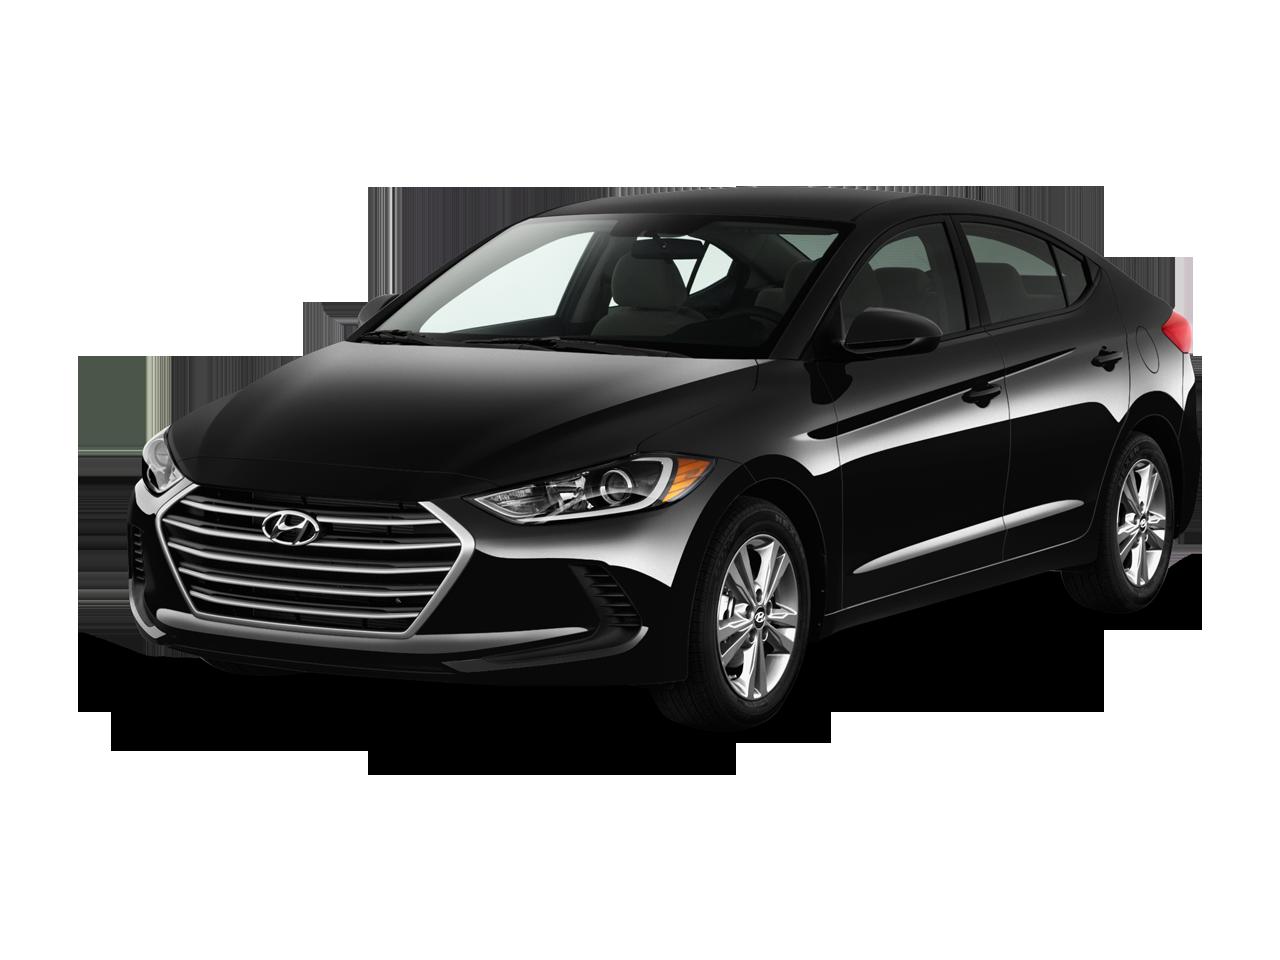 Toyota Sienna Service Manual: Vehicle Speed Sensor A